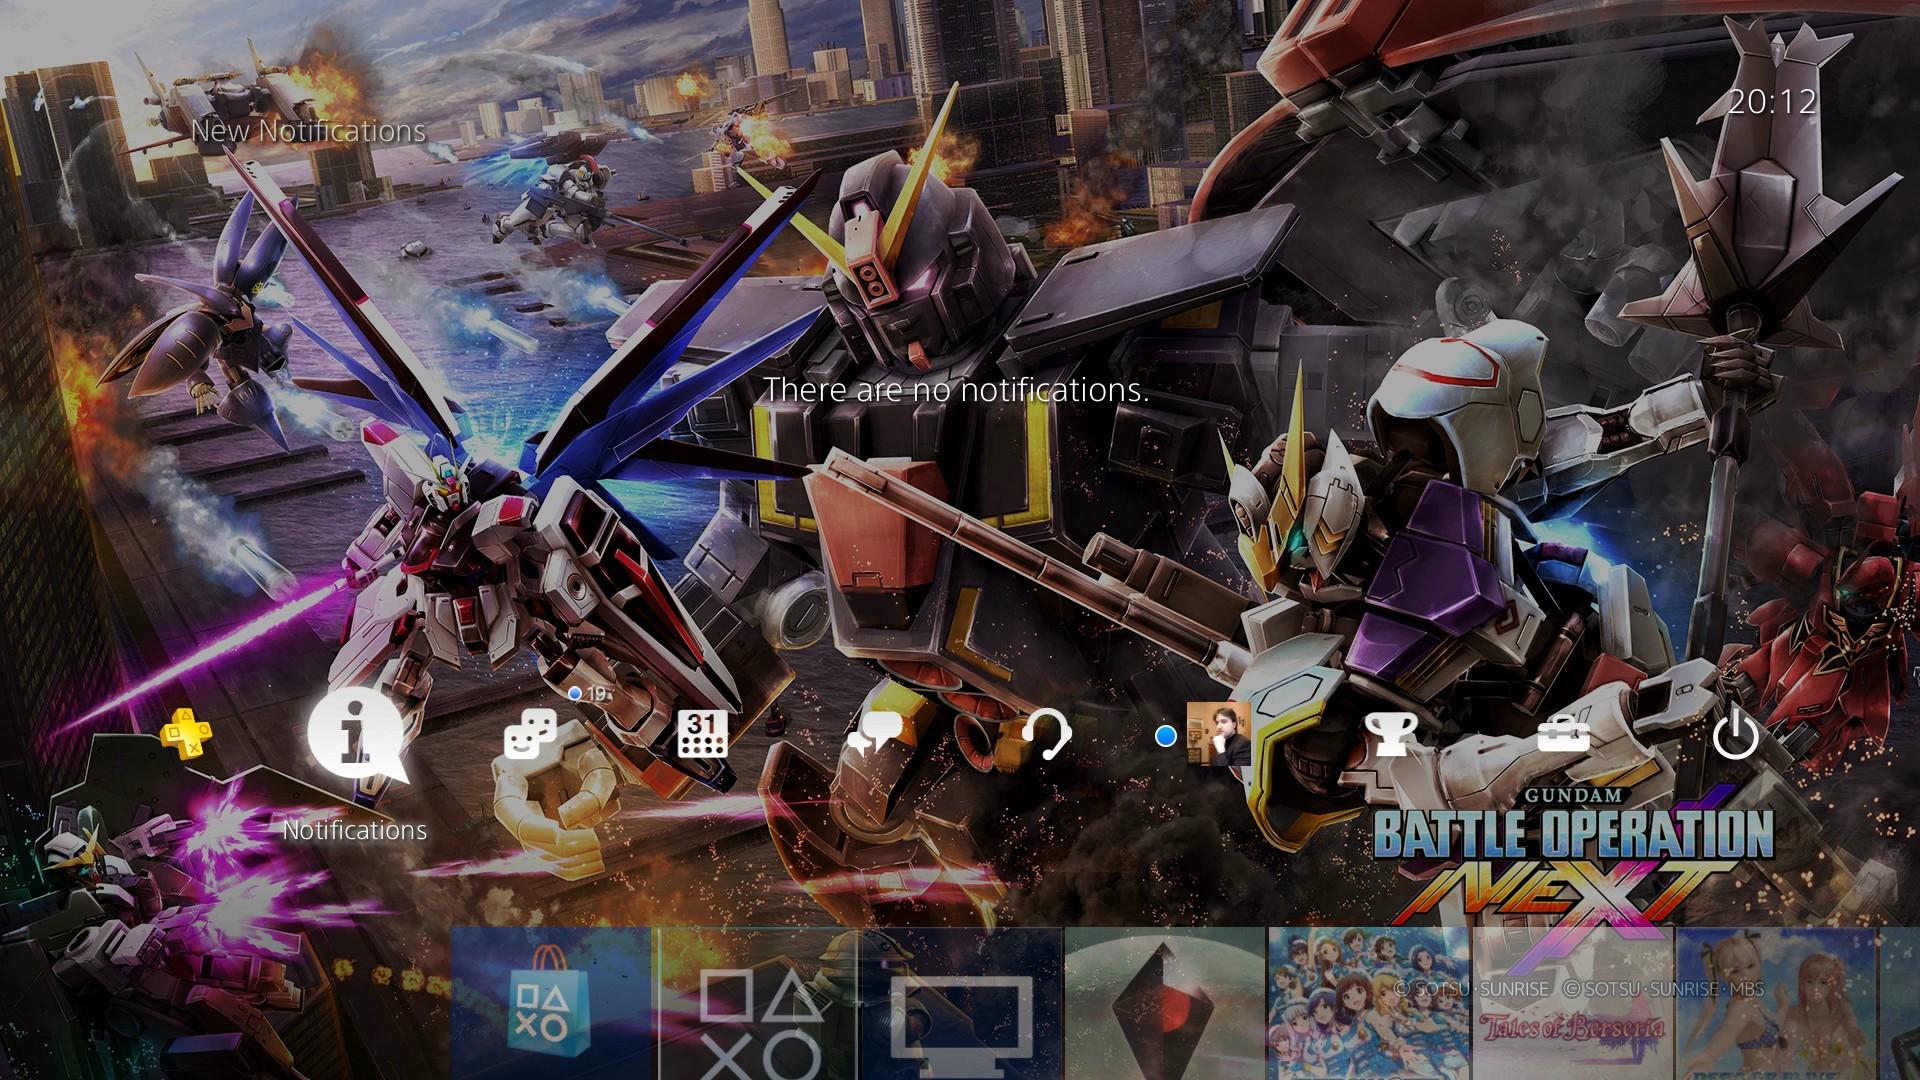 Gundam Battle Operation NEXT tema PS4